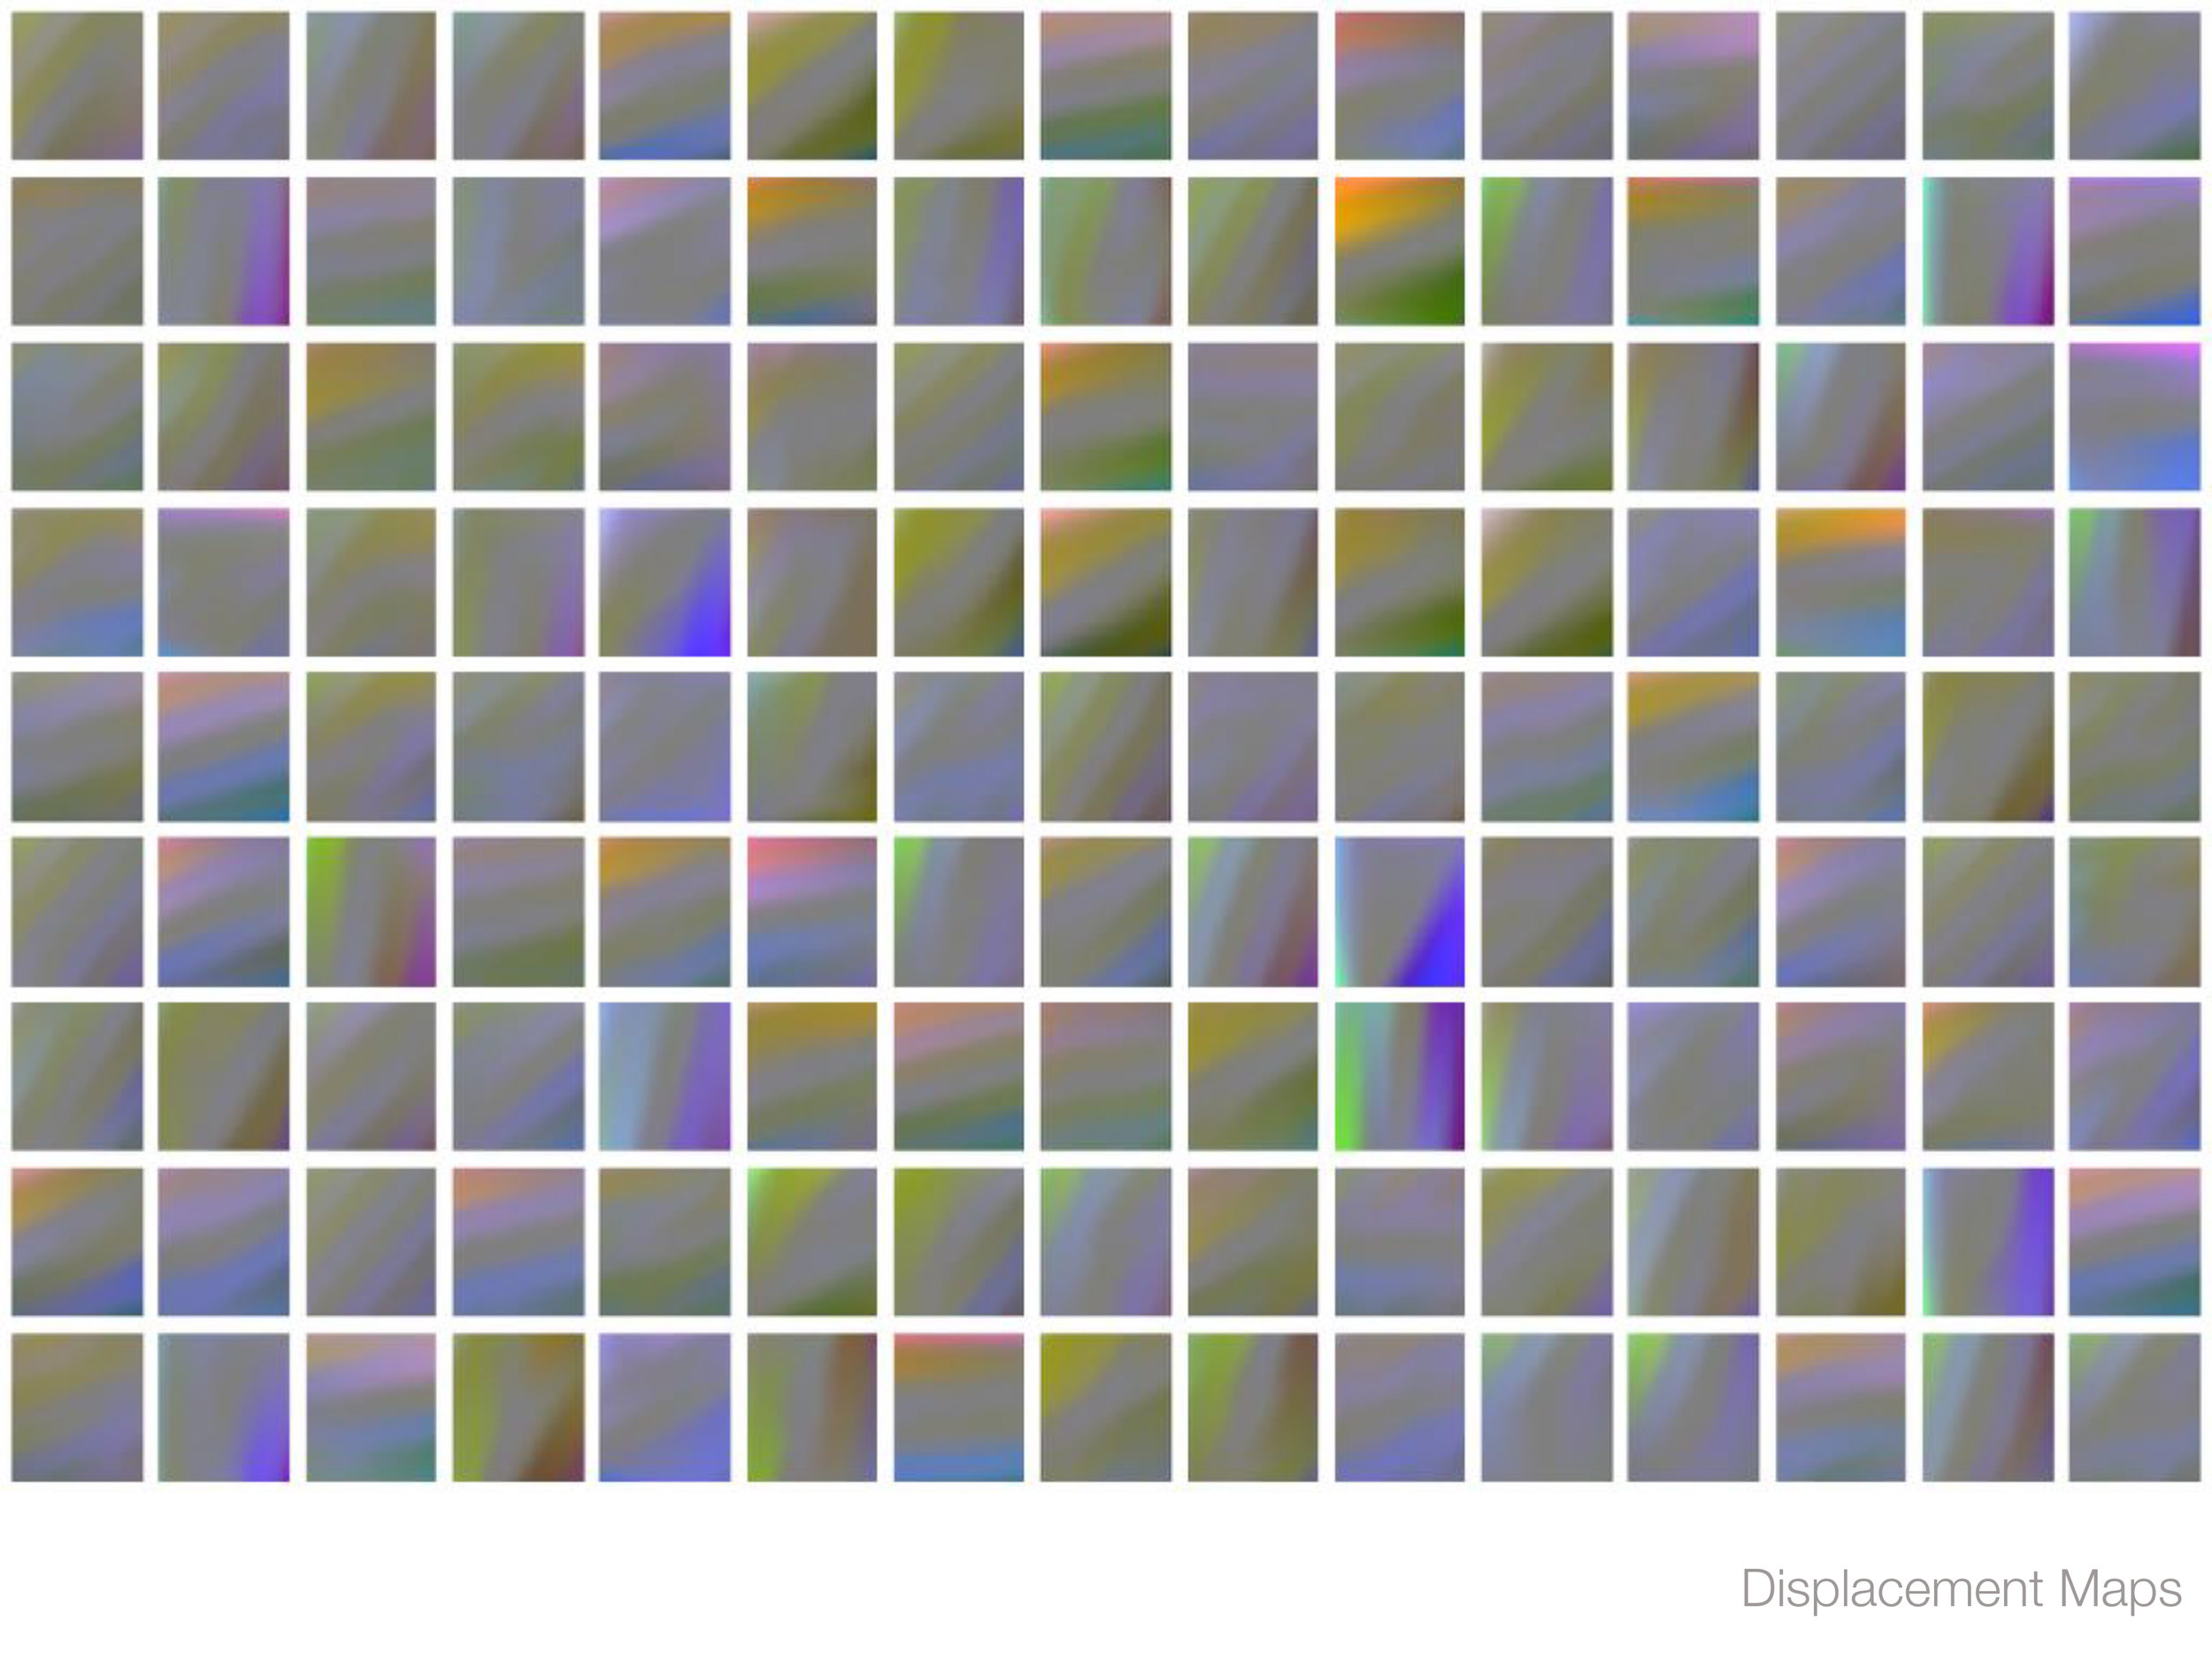 tensorflow_8.jpg